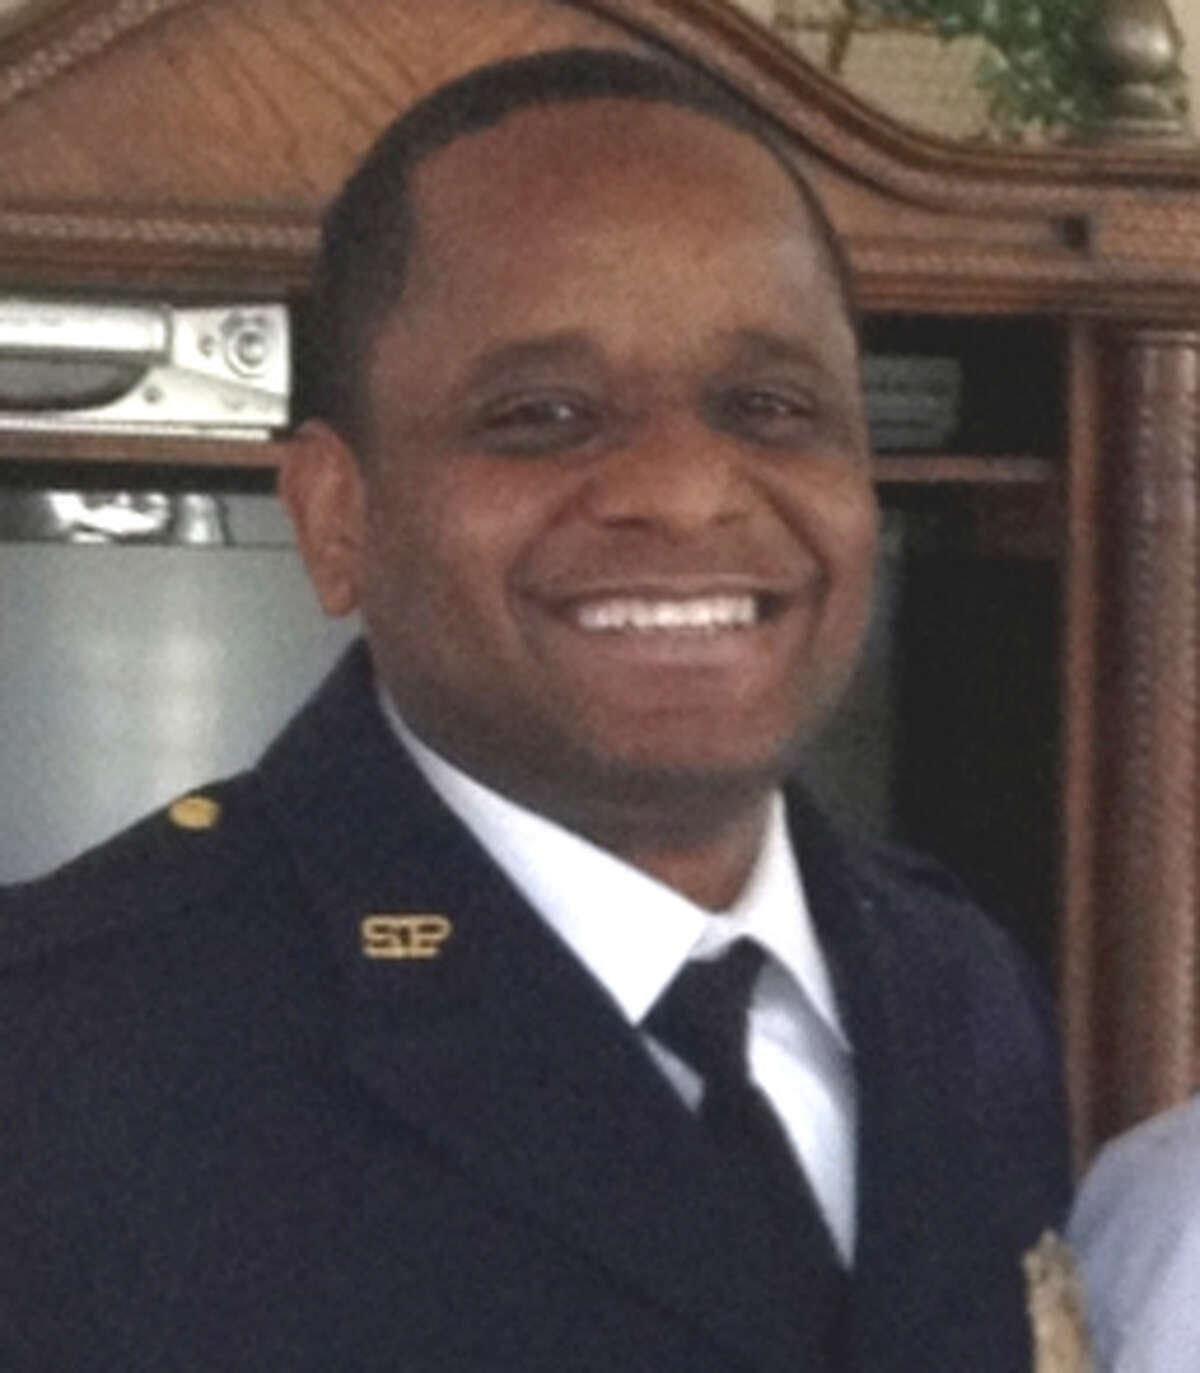 Lt. Donnie Lowe (SPD photo)